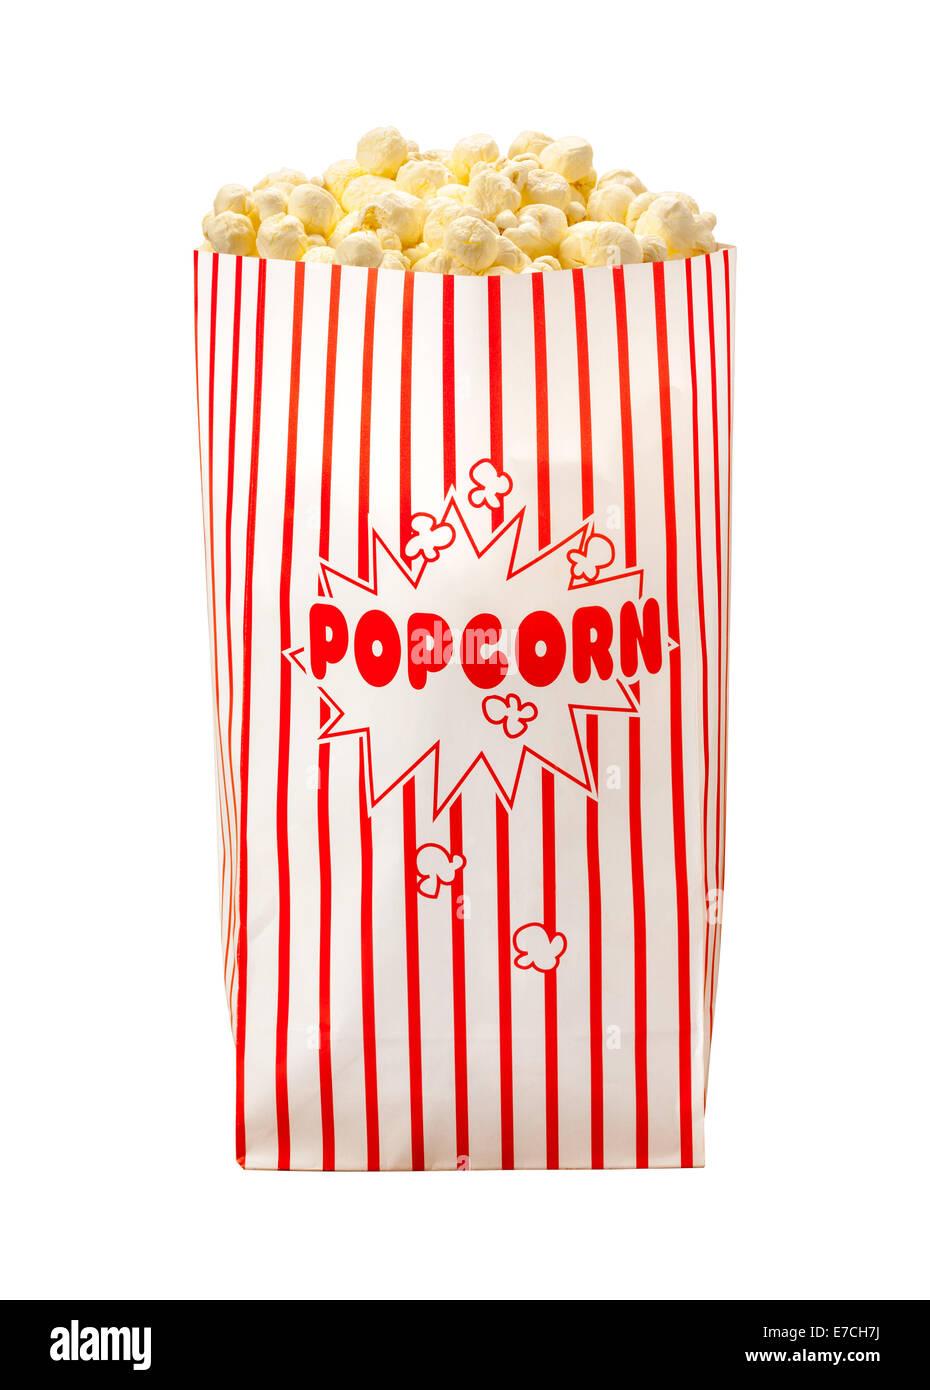 Sac Popcorn isolé sur un fond blanc. Photo Stock